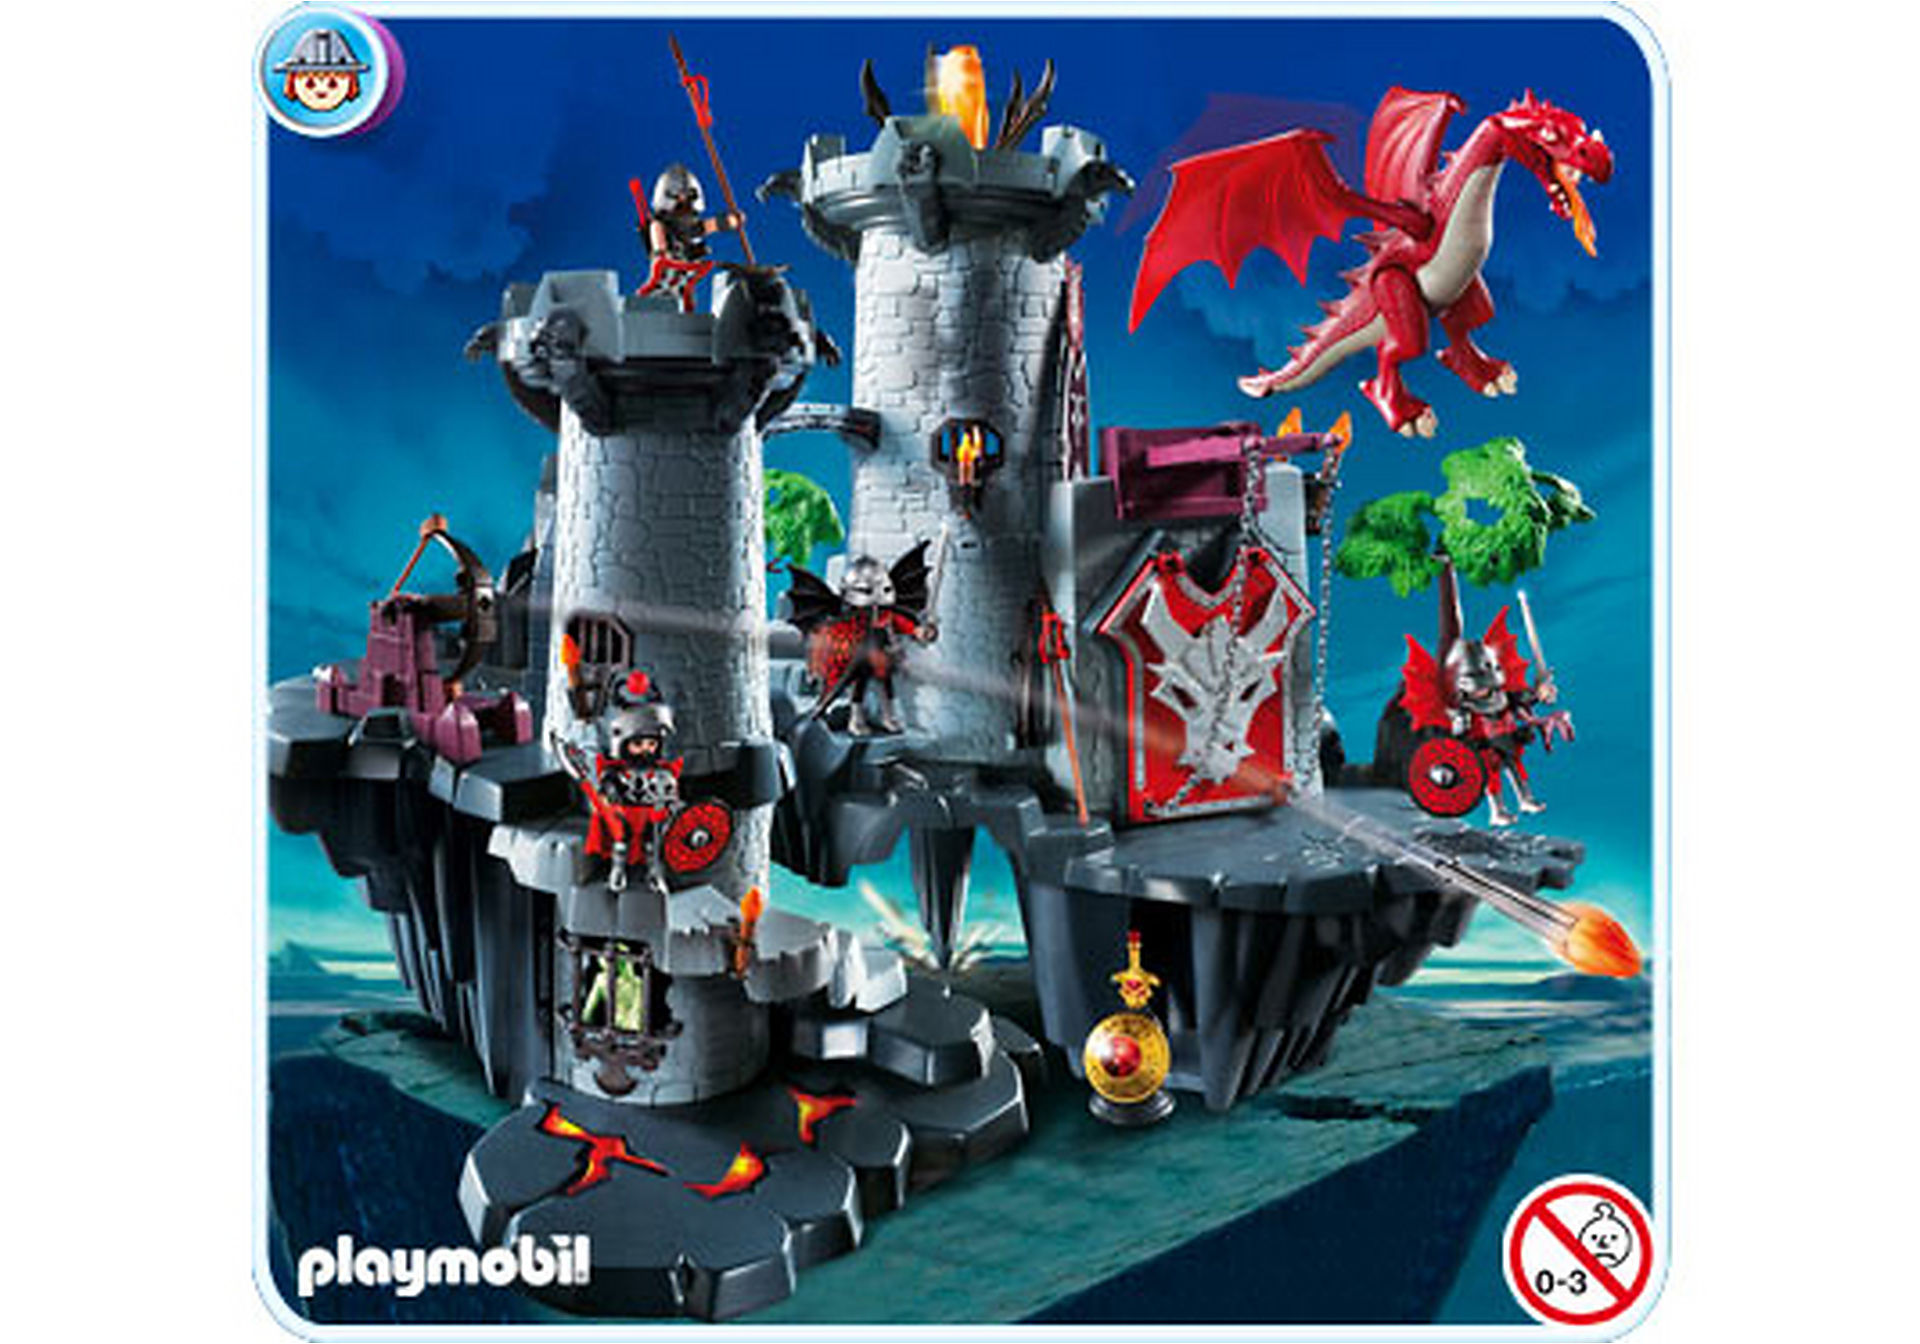 http://media.playmobil.com/i/playmobil/4835-A_product_detail/Große Drachenburg